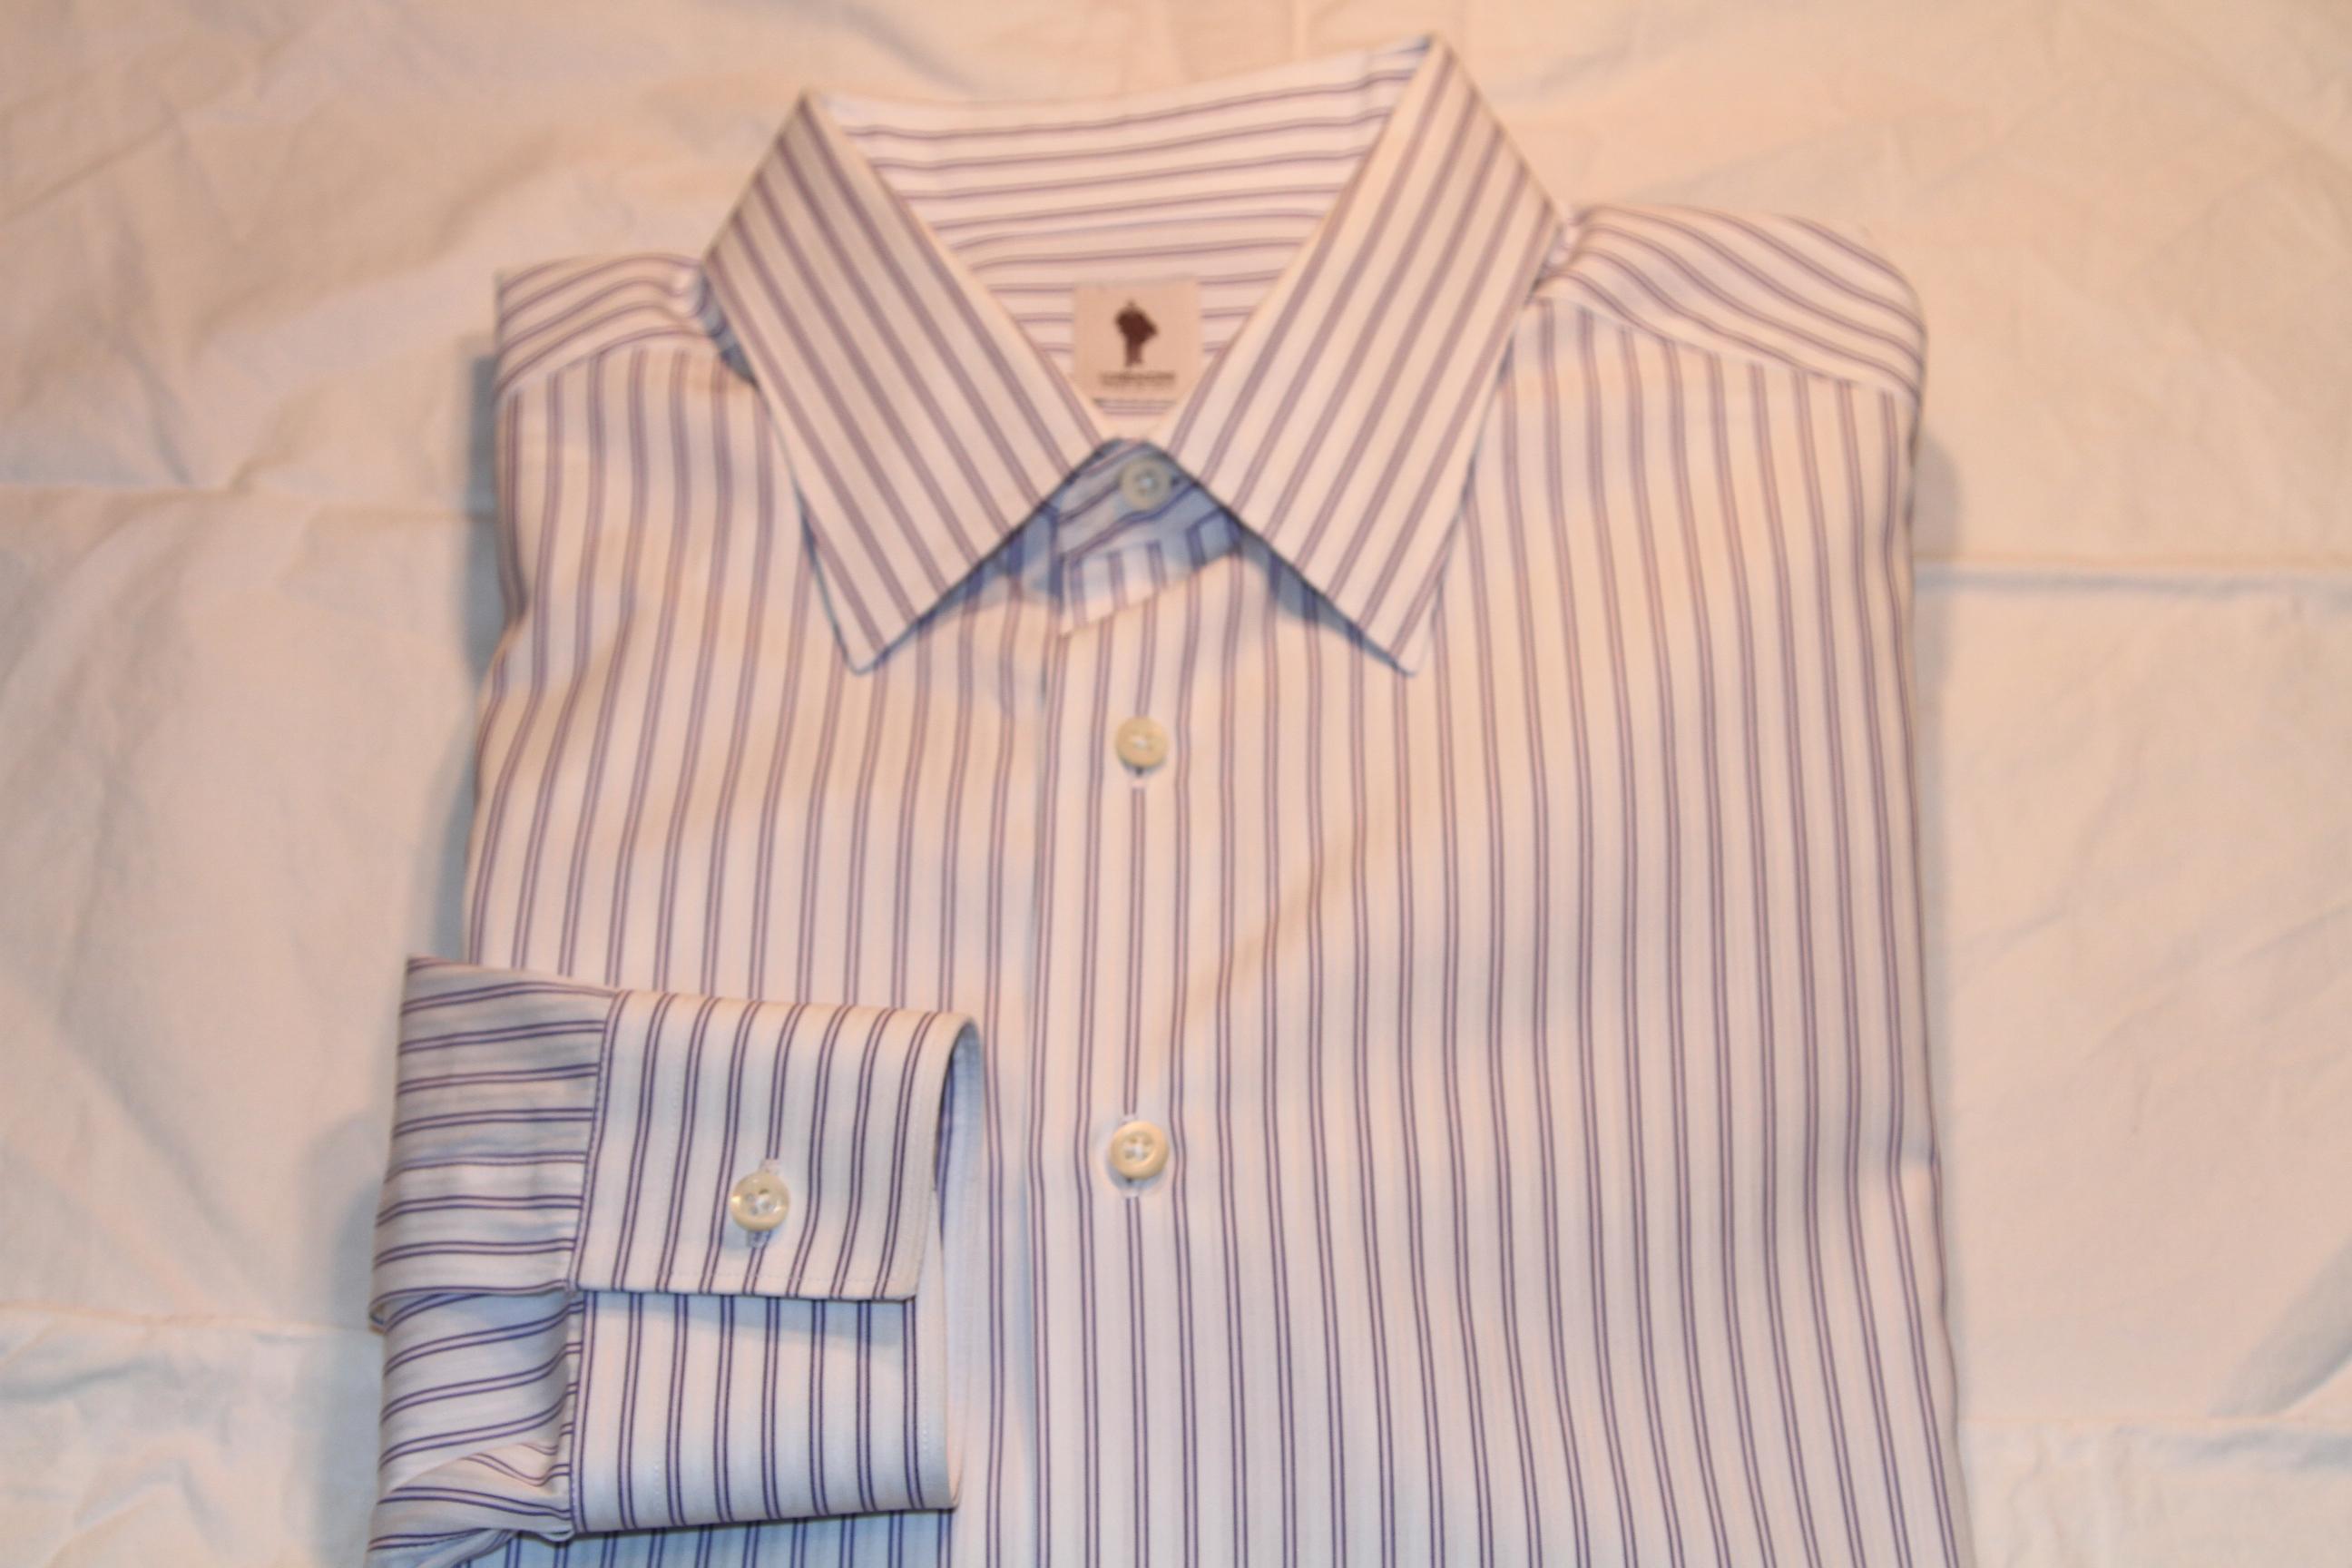 #21 - Lorenzini 41/16 White with Purple Stripe